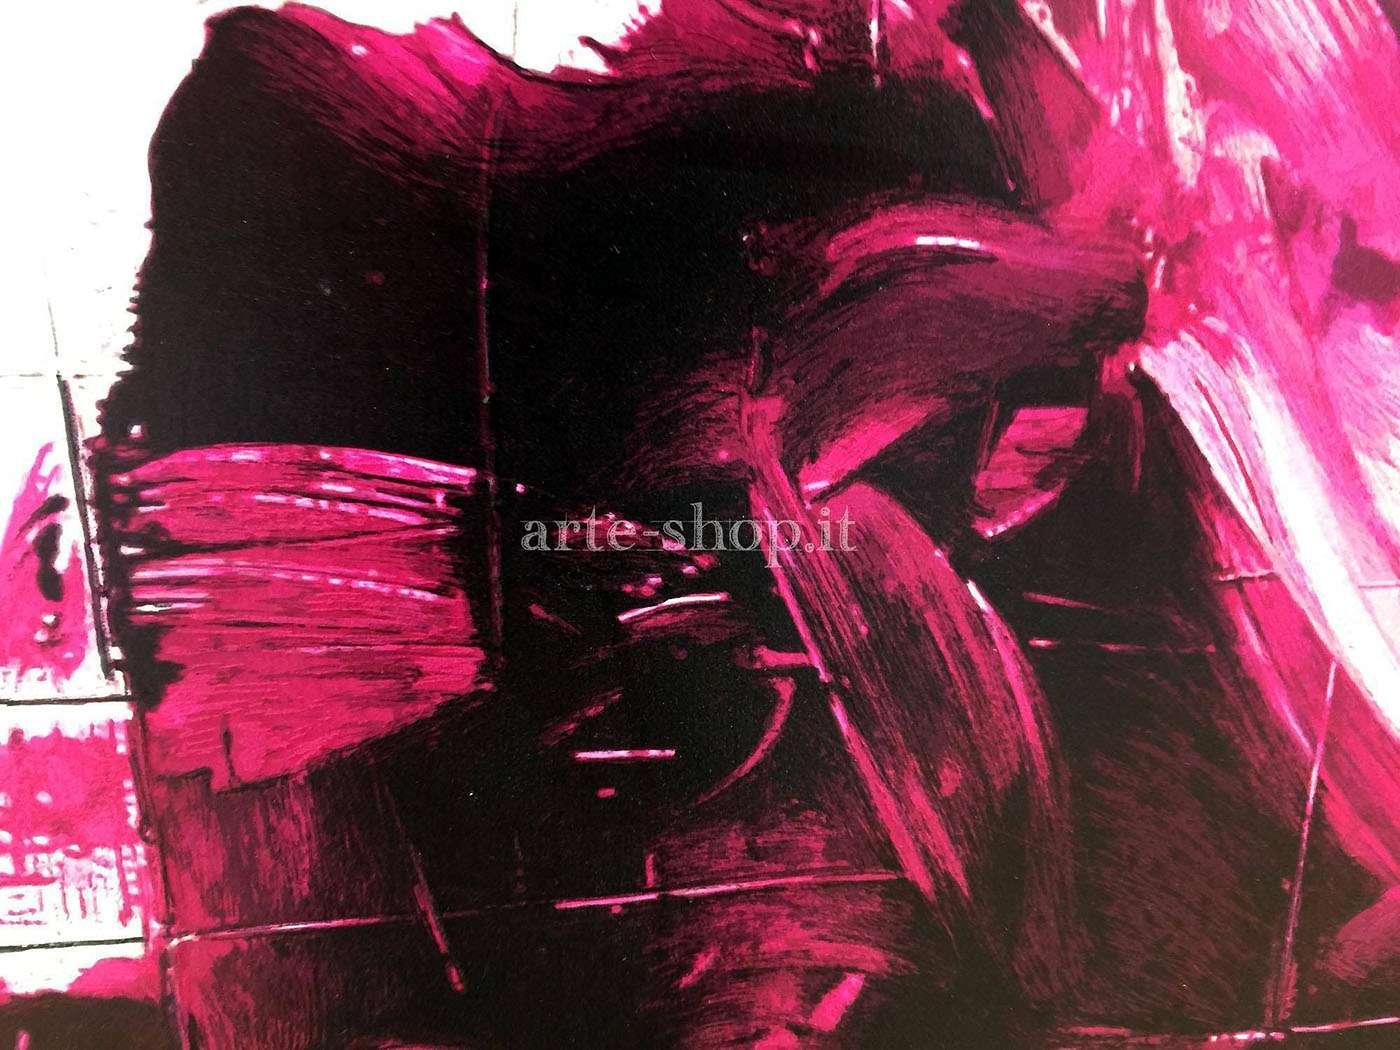 arte pentagono shop dettaglio numero 1124